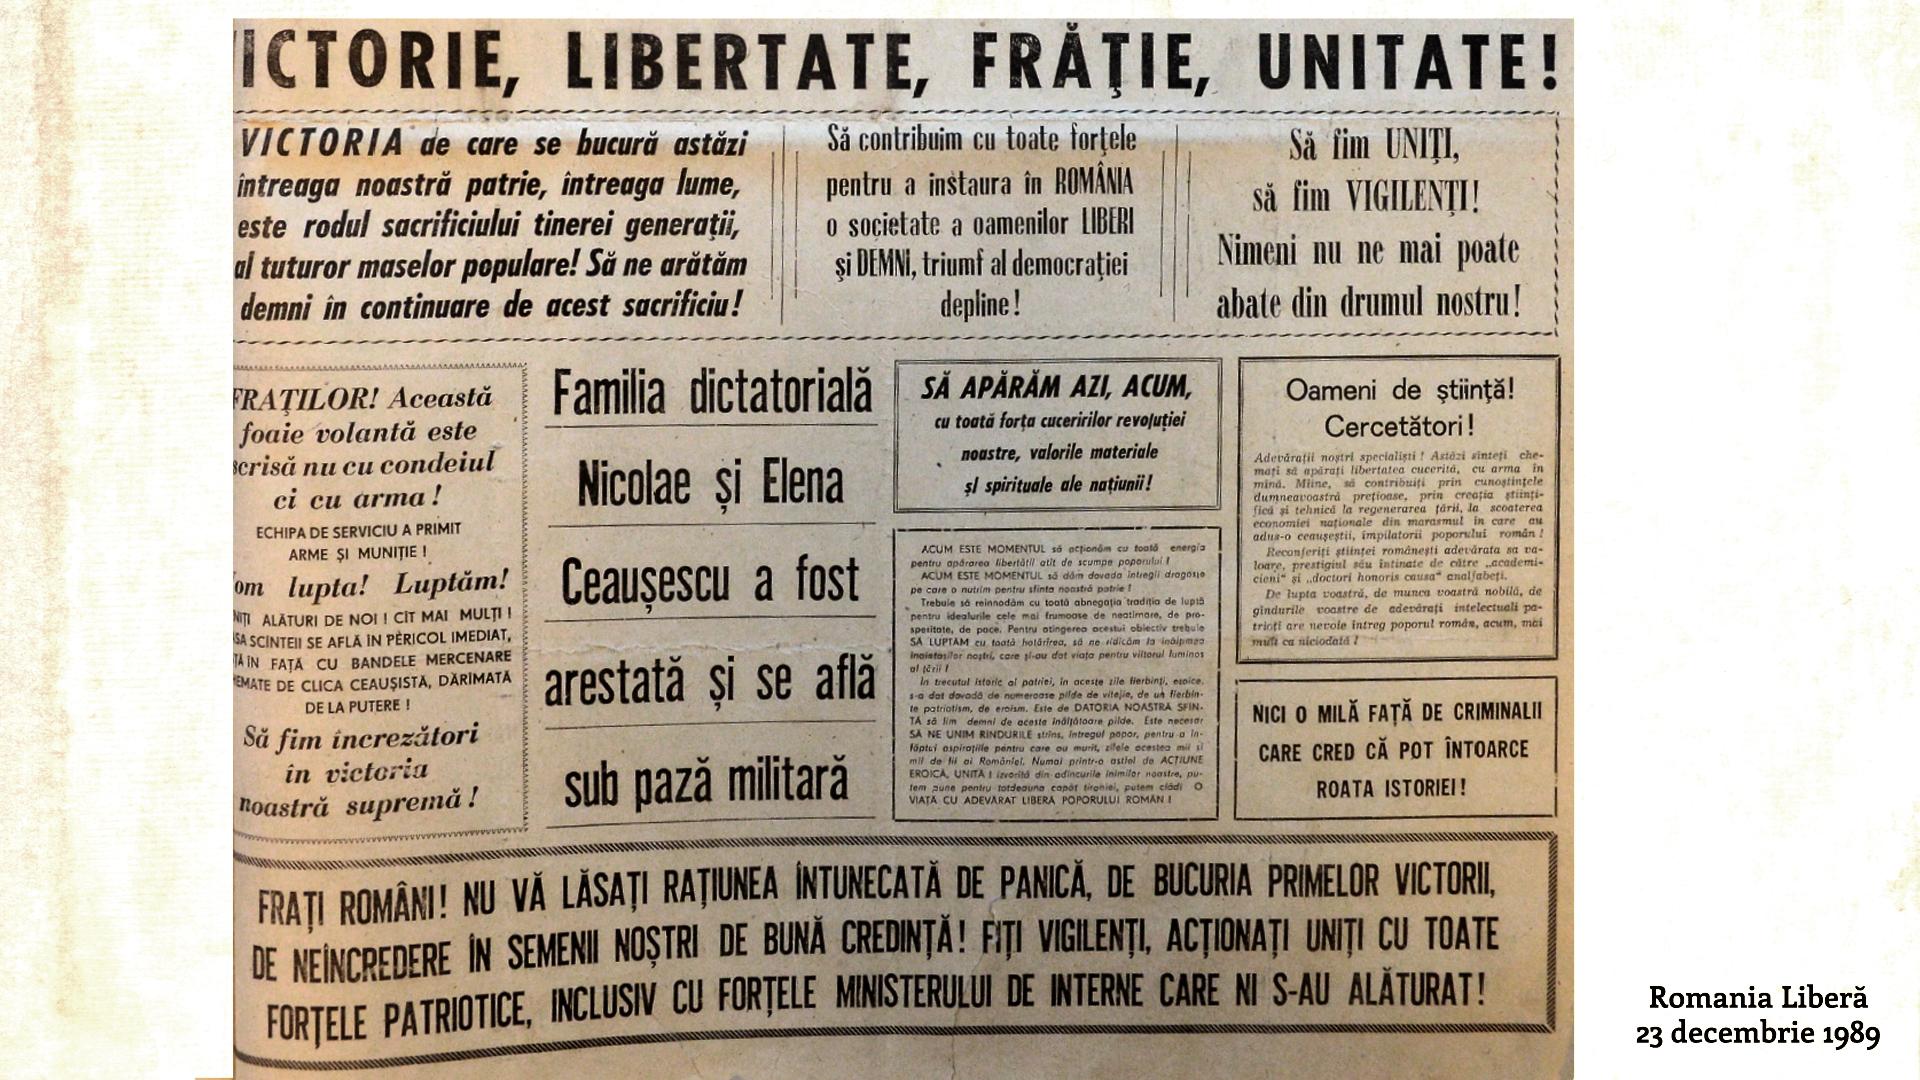 4-Romania Libera 23.12